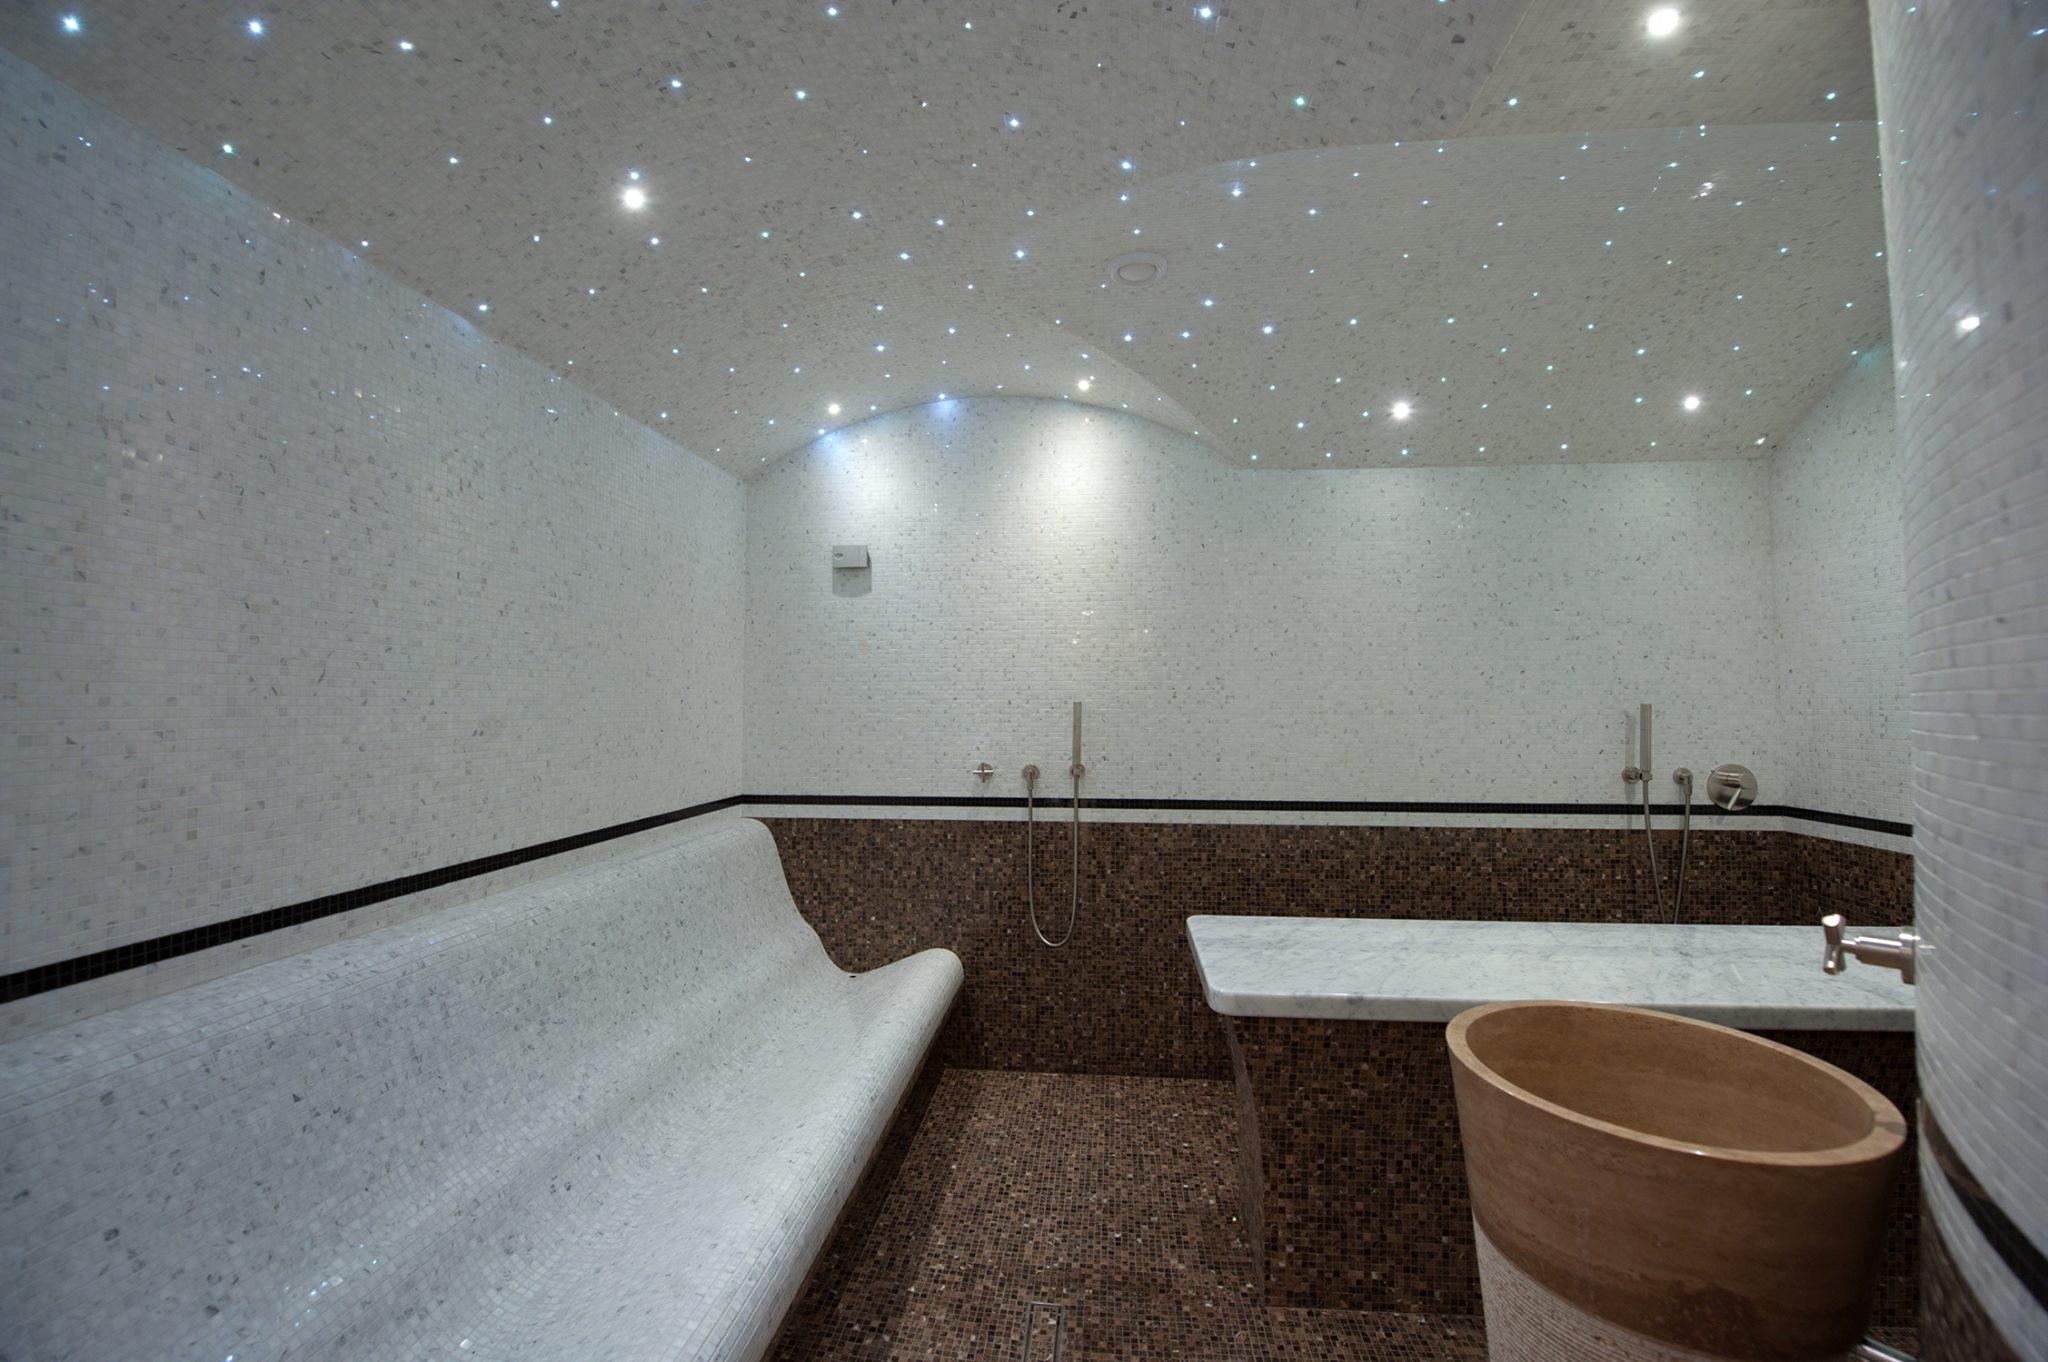 cieli-stellati-piscine-cobb-1